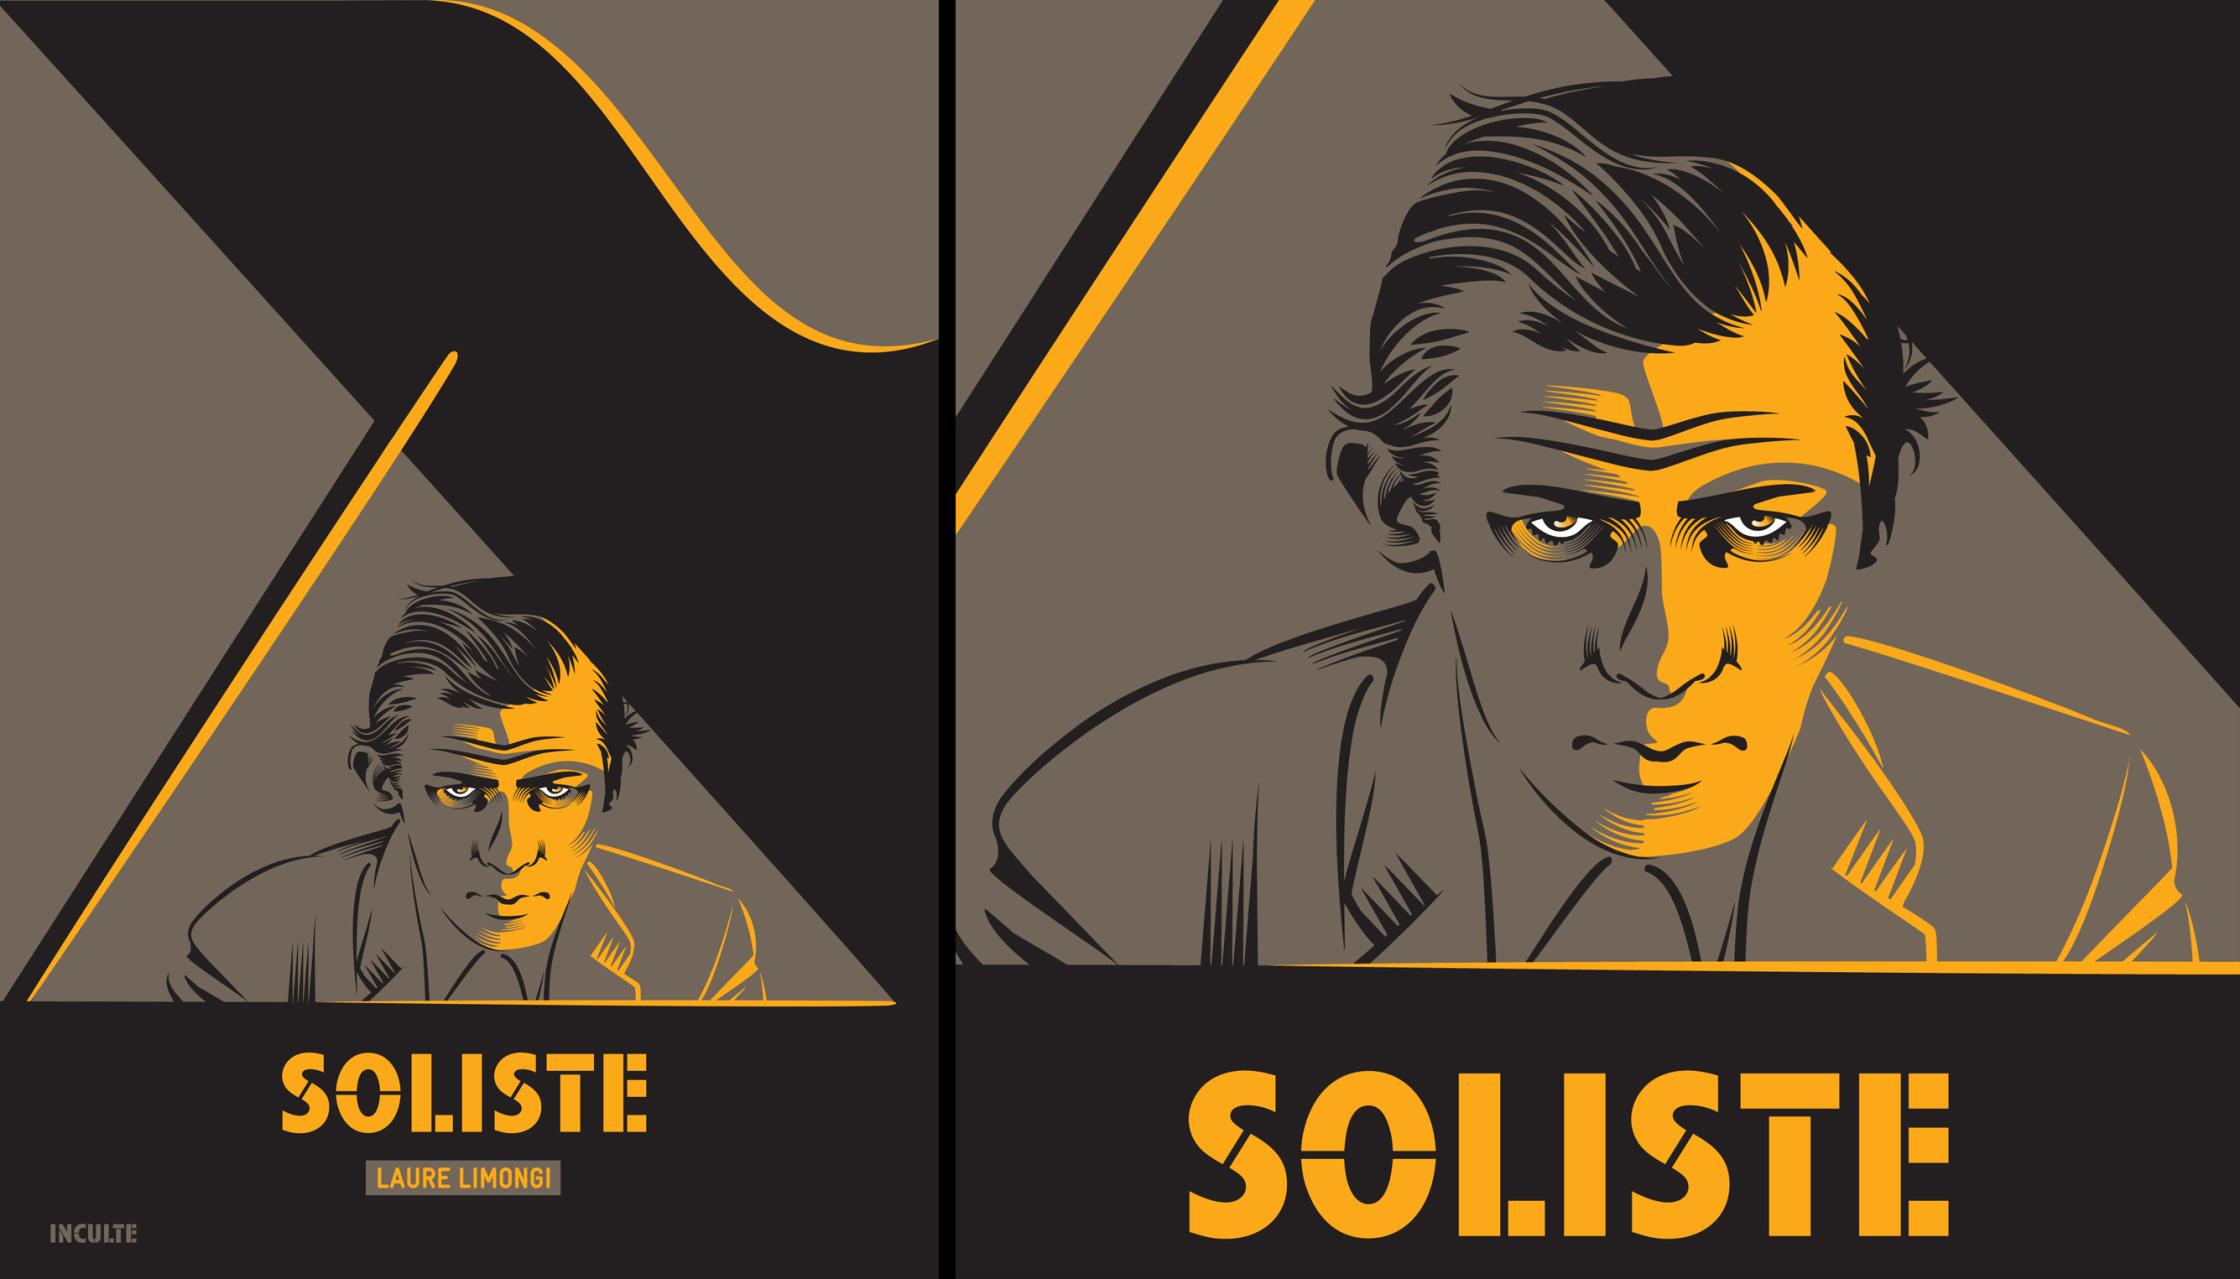 Soliste Book Cover